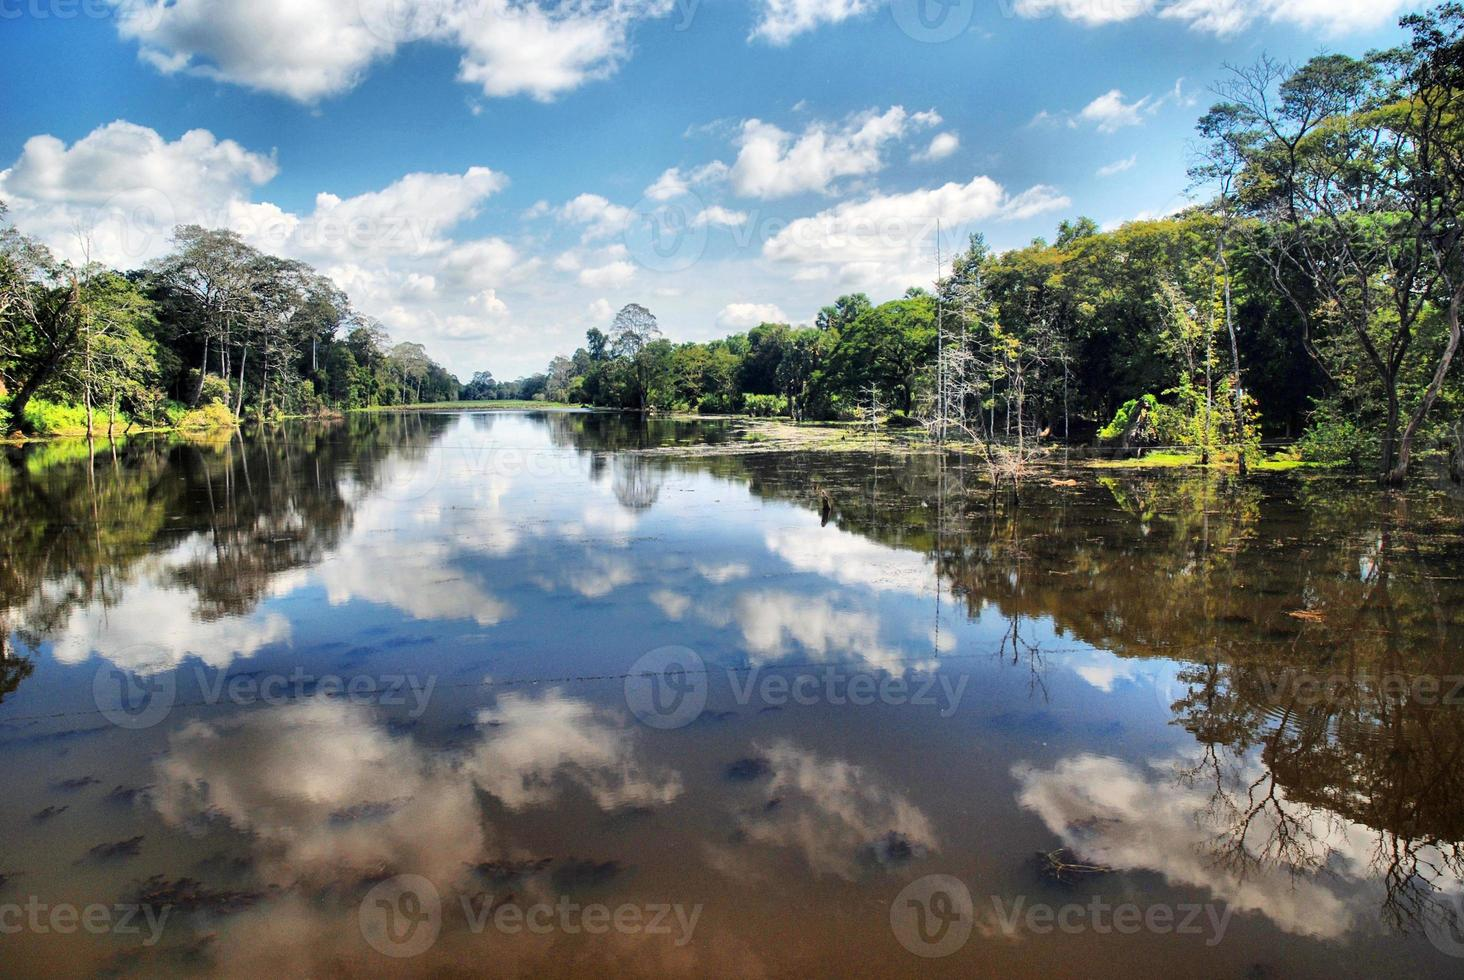 rivière au cambodge / siem reap photo